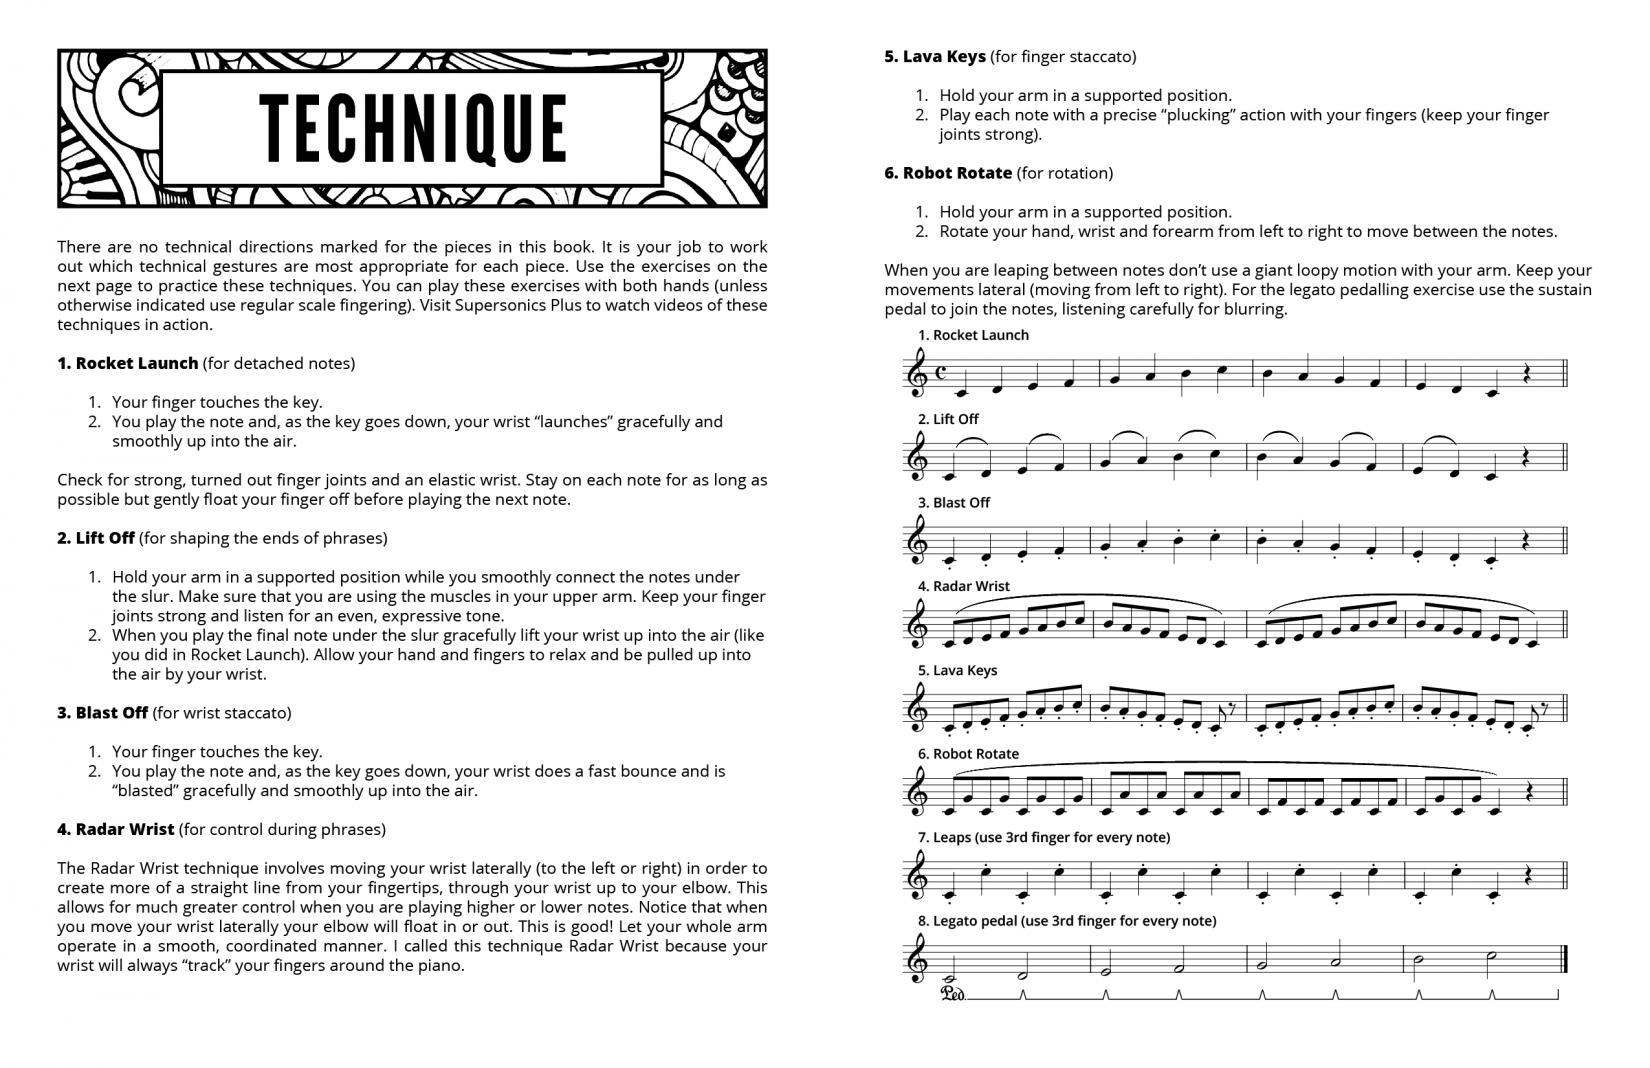 Supersonics Piano Method Level 4 Air Navigators sample